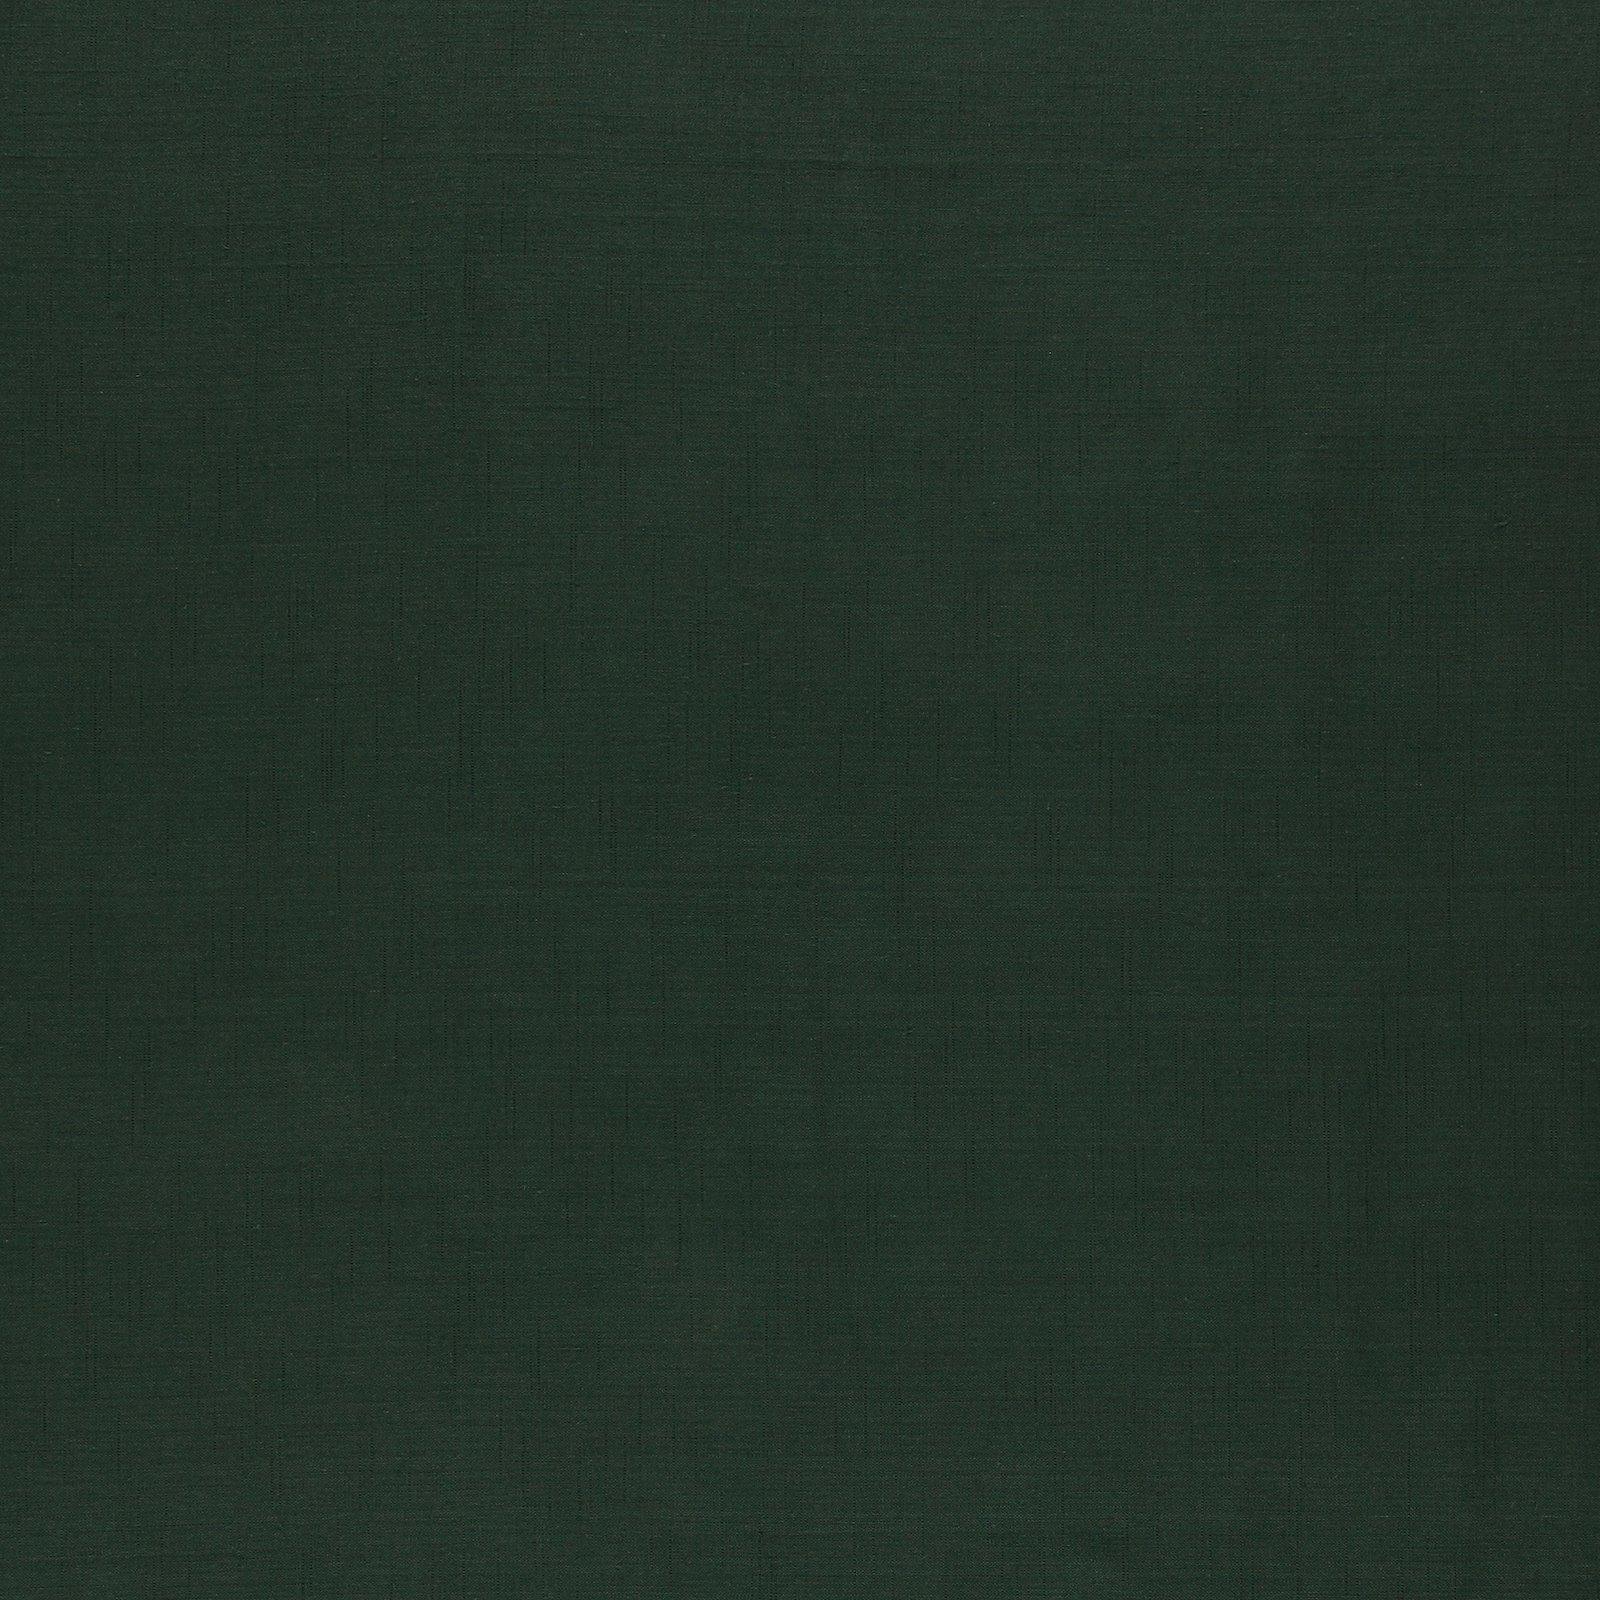 Coarse linen/viscose dark bottle green 852320_pack_solid